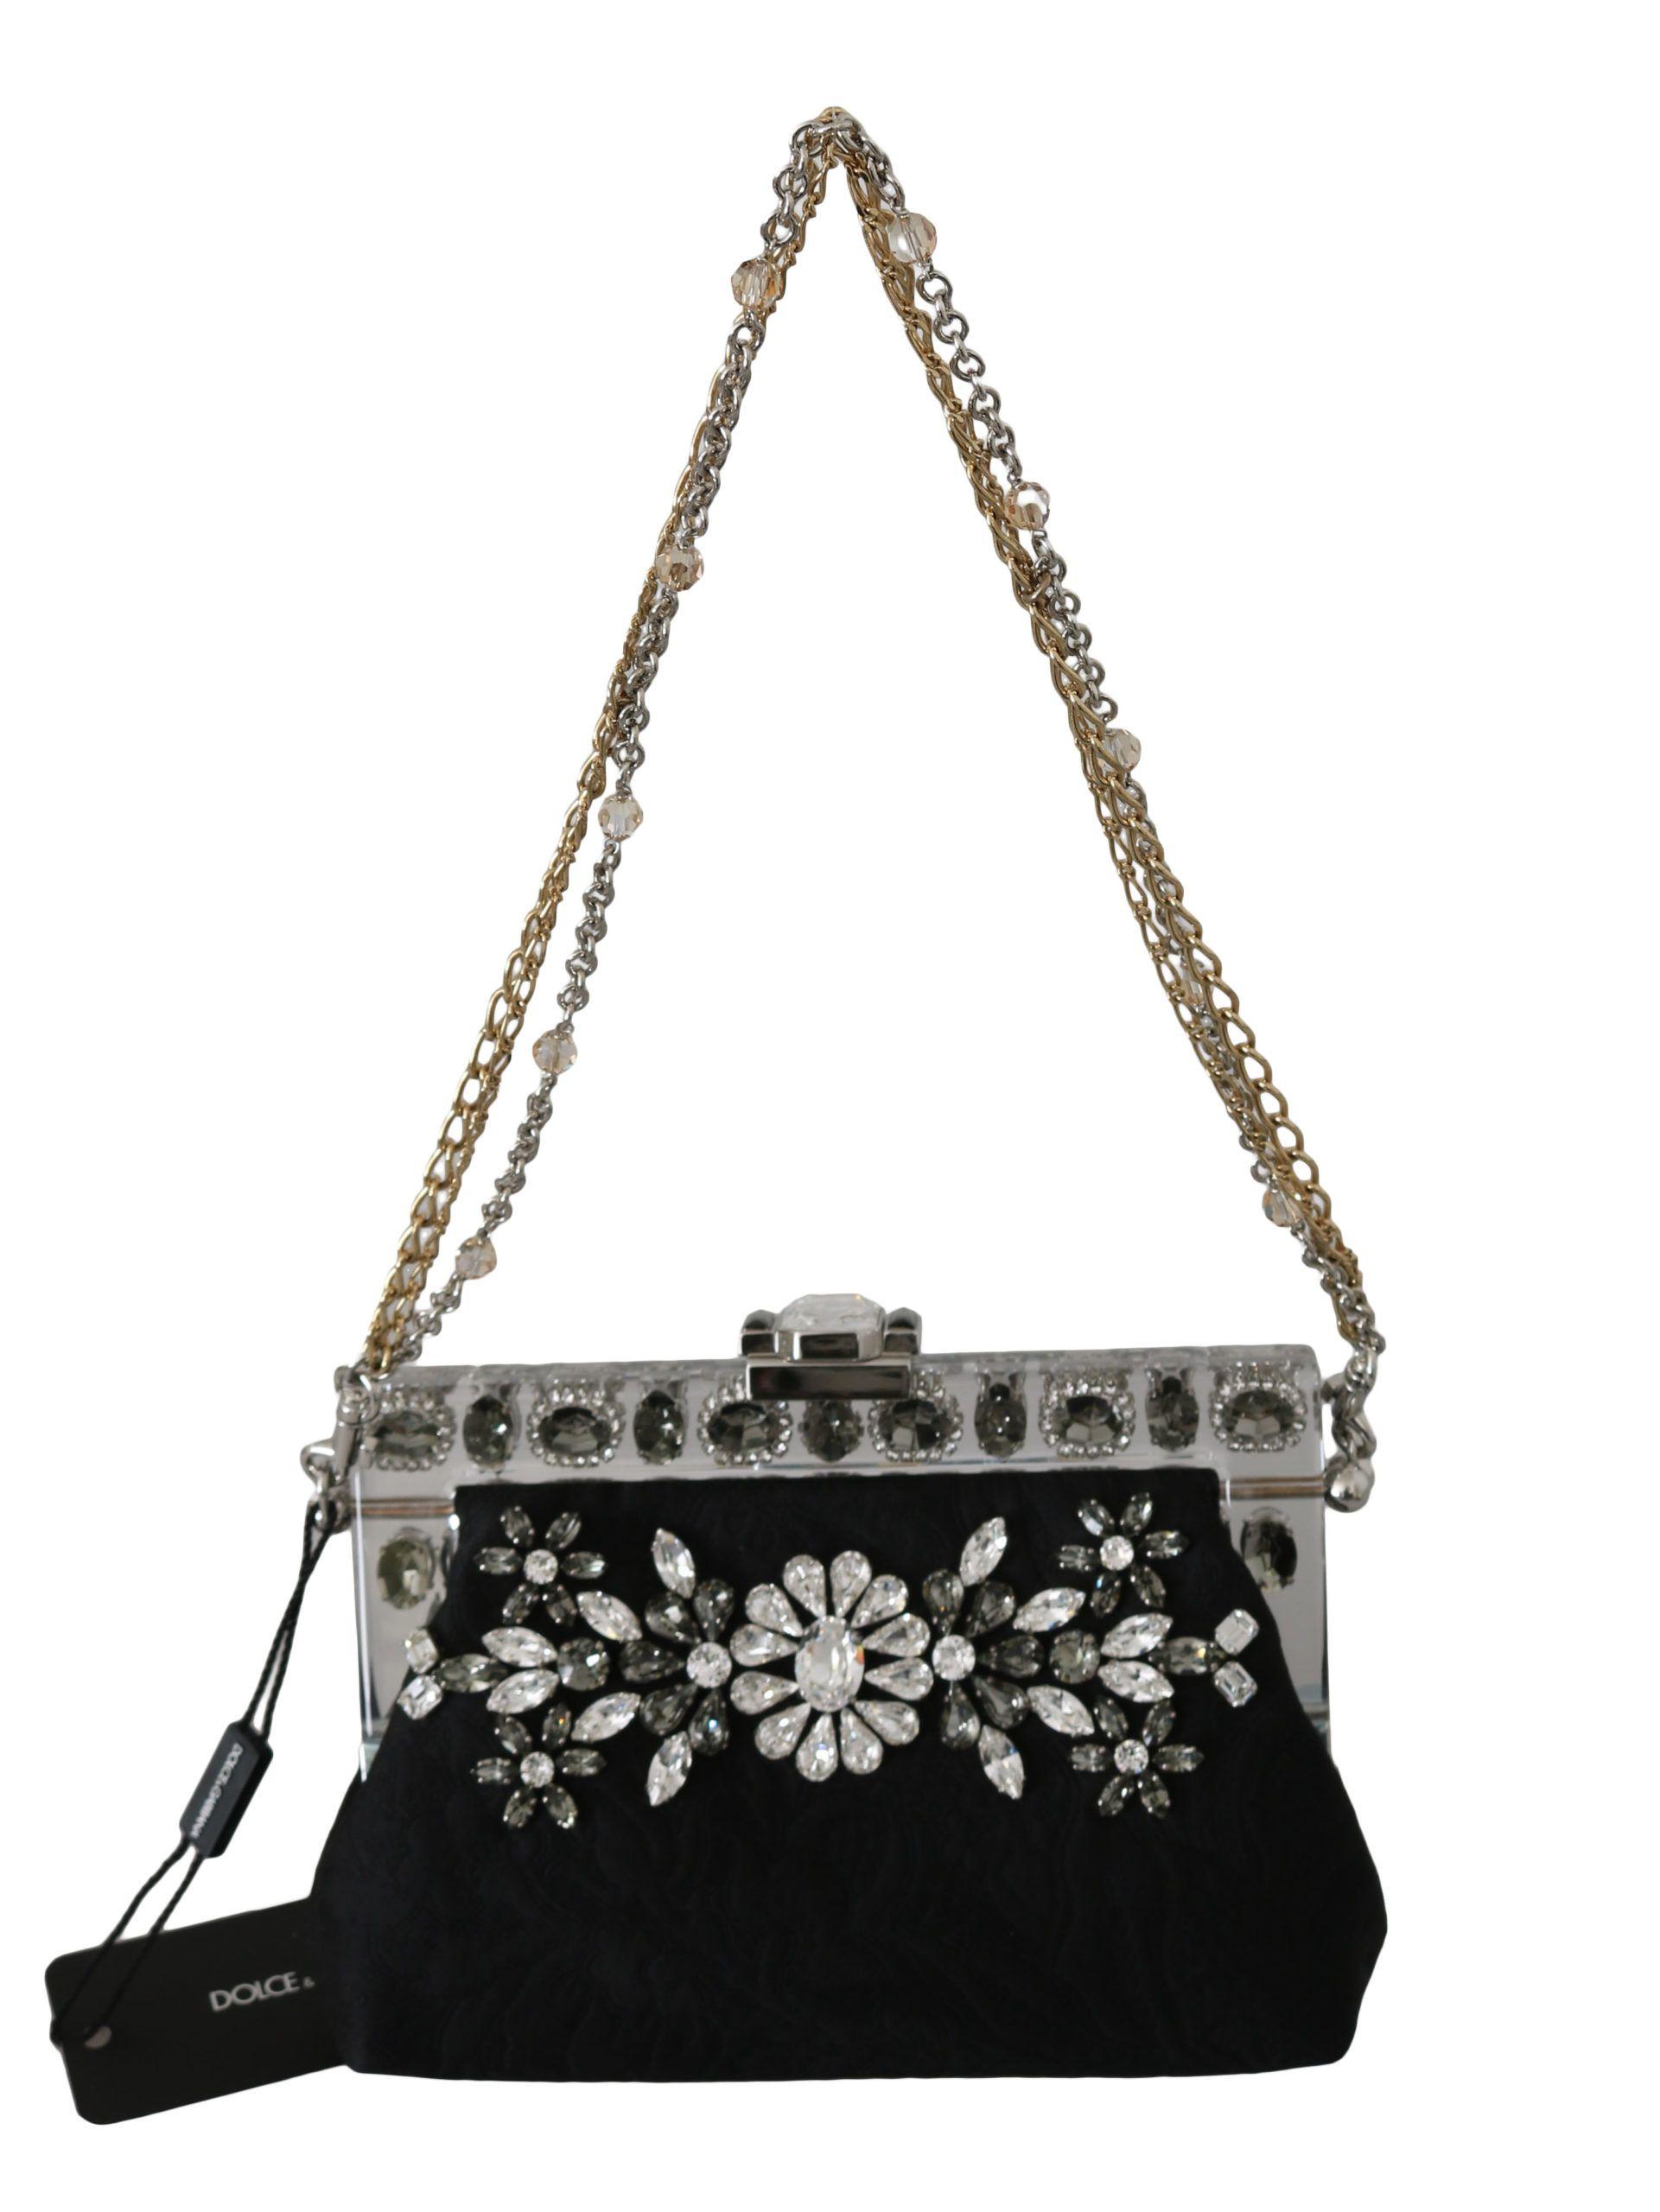 Dolce & Gabbana Red Leopard Adjustable Drawstring Women Nap Sack Bag